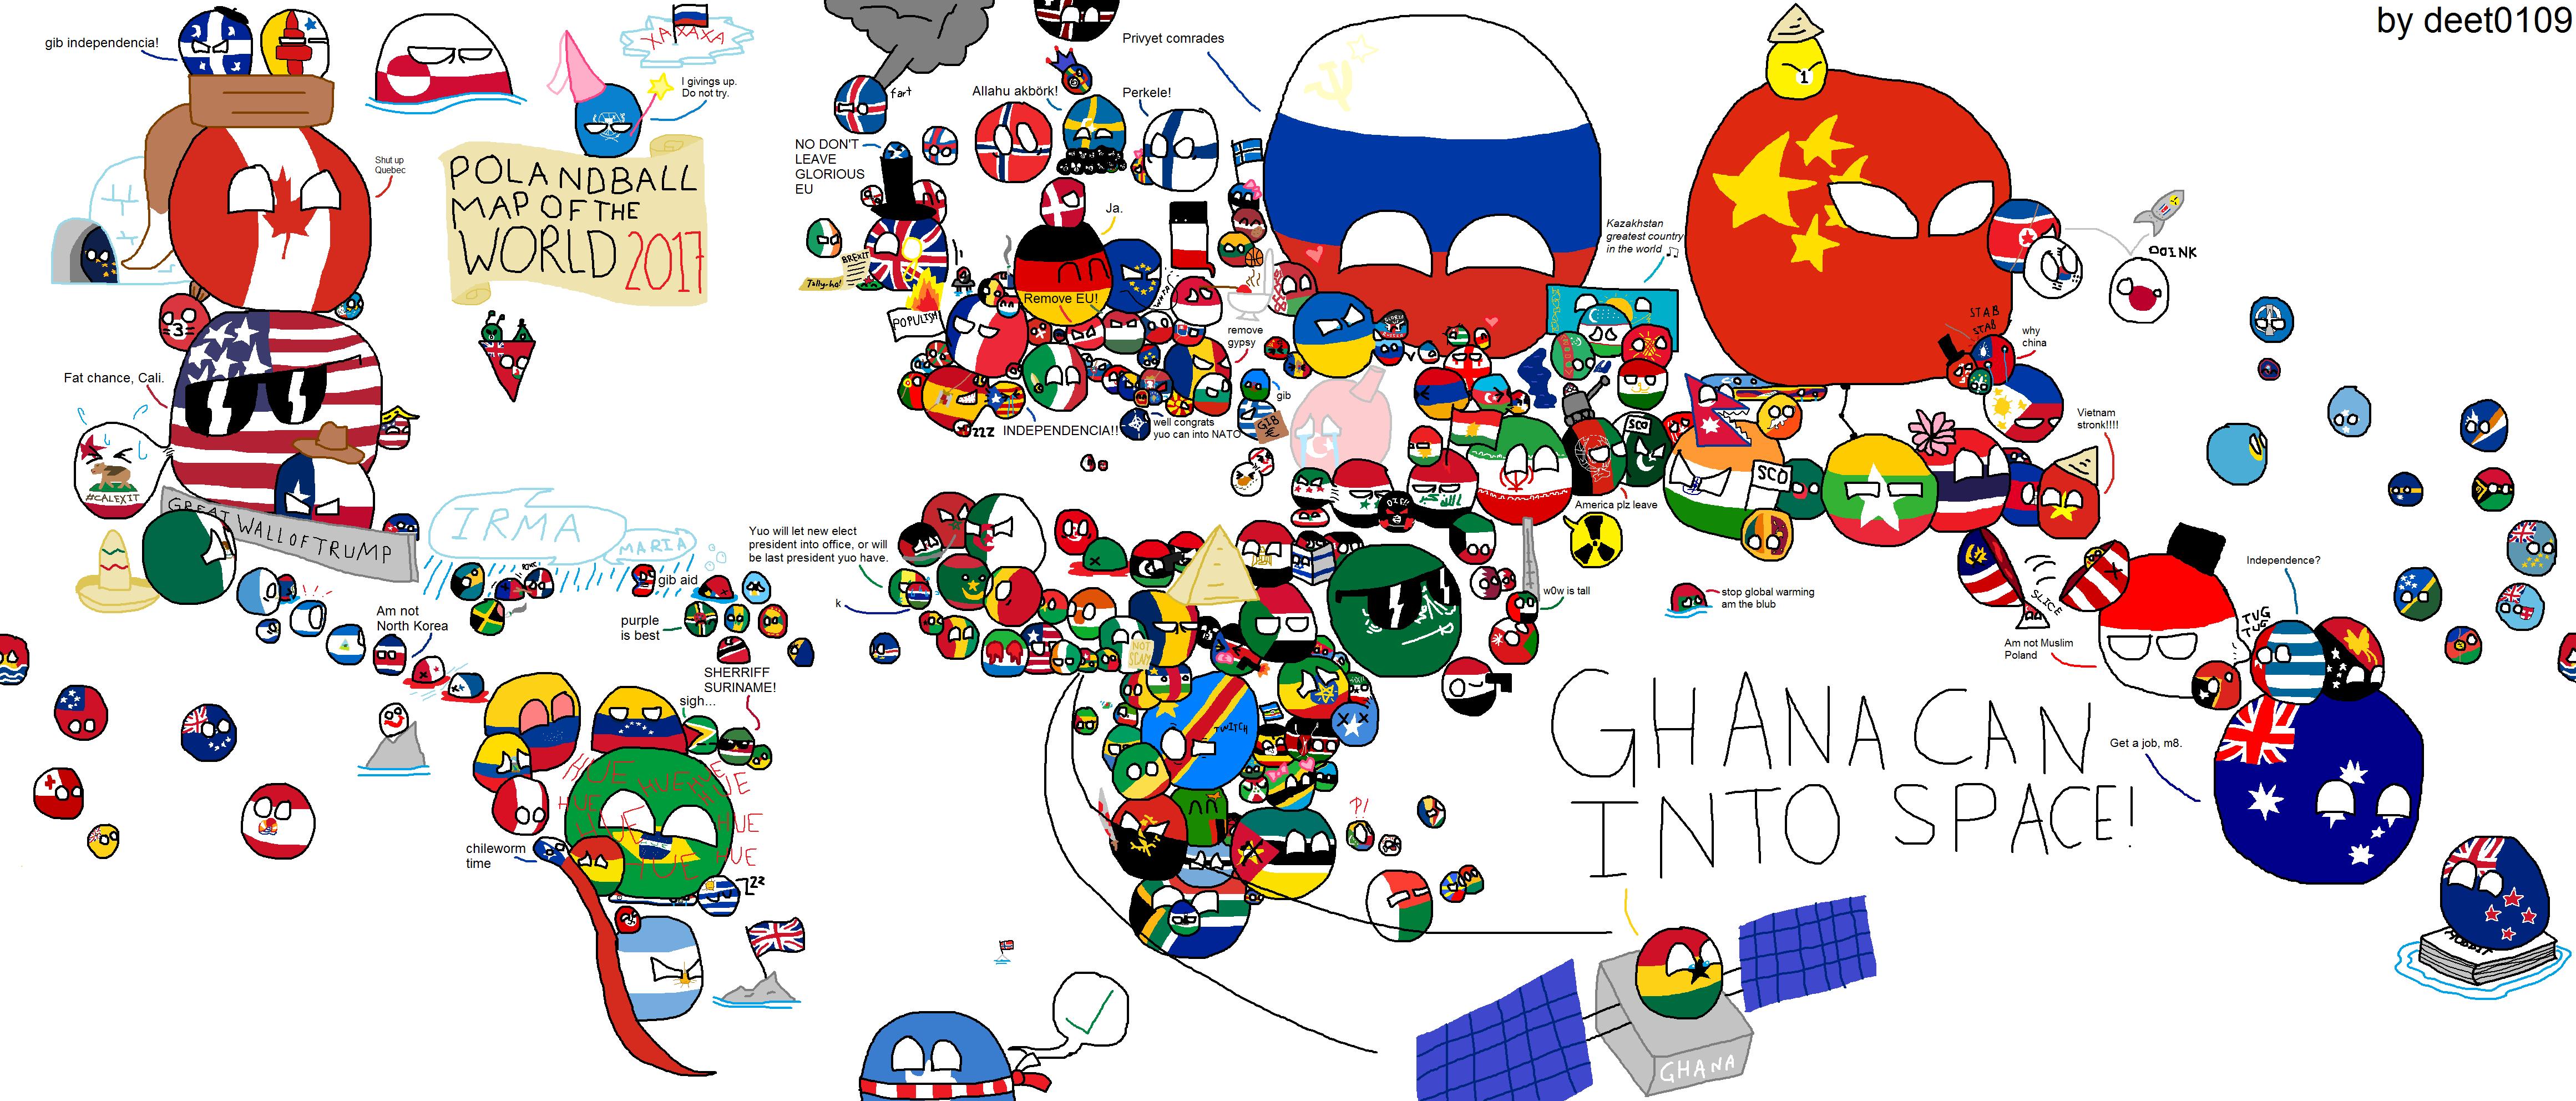 Polandball Map Of The World 2017.Polandball Map Of The World 2017 Myachiki Pinterest Funny